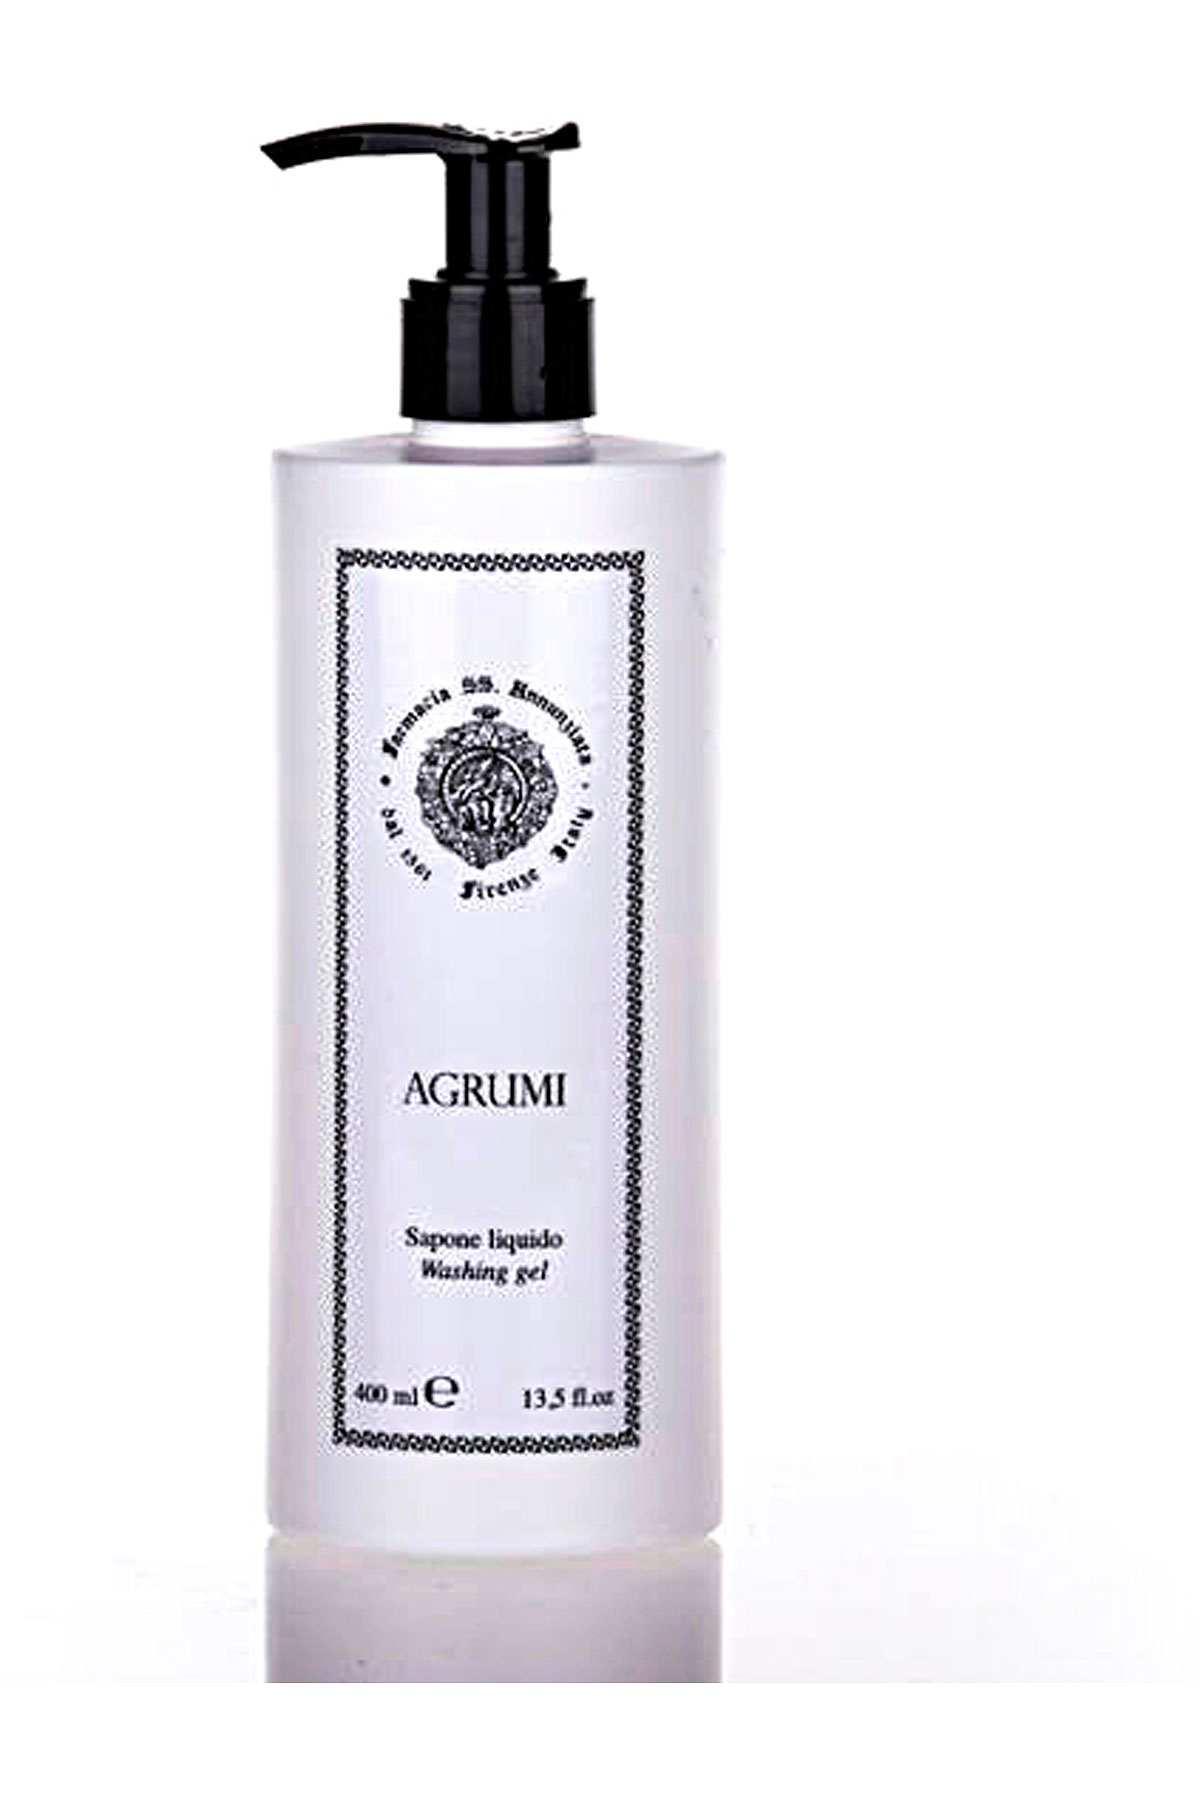 Farmacia Ss Annunziata 1561 Beauty for Women On Sale, Agrumi - Liquid Soap - 400 Ml, 2019, 400 ml